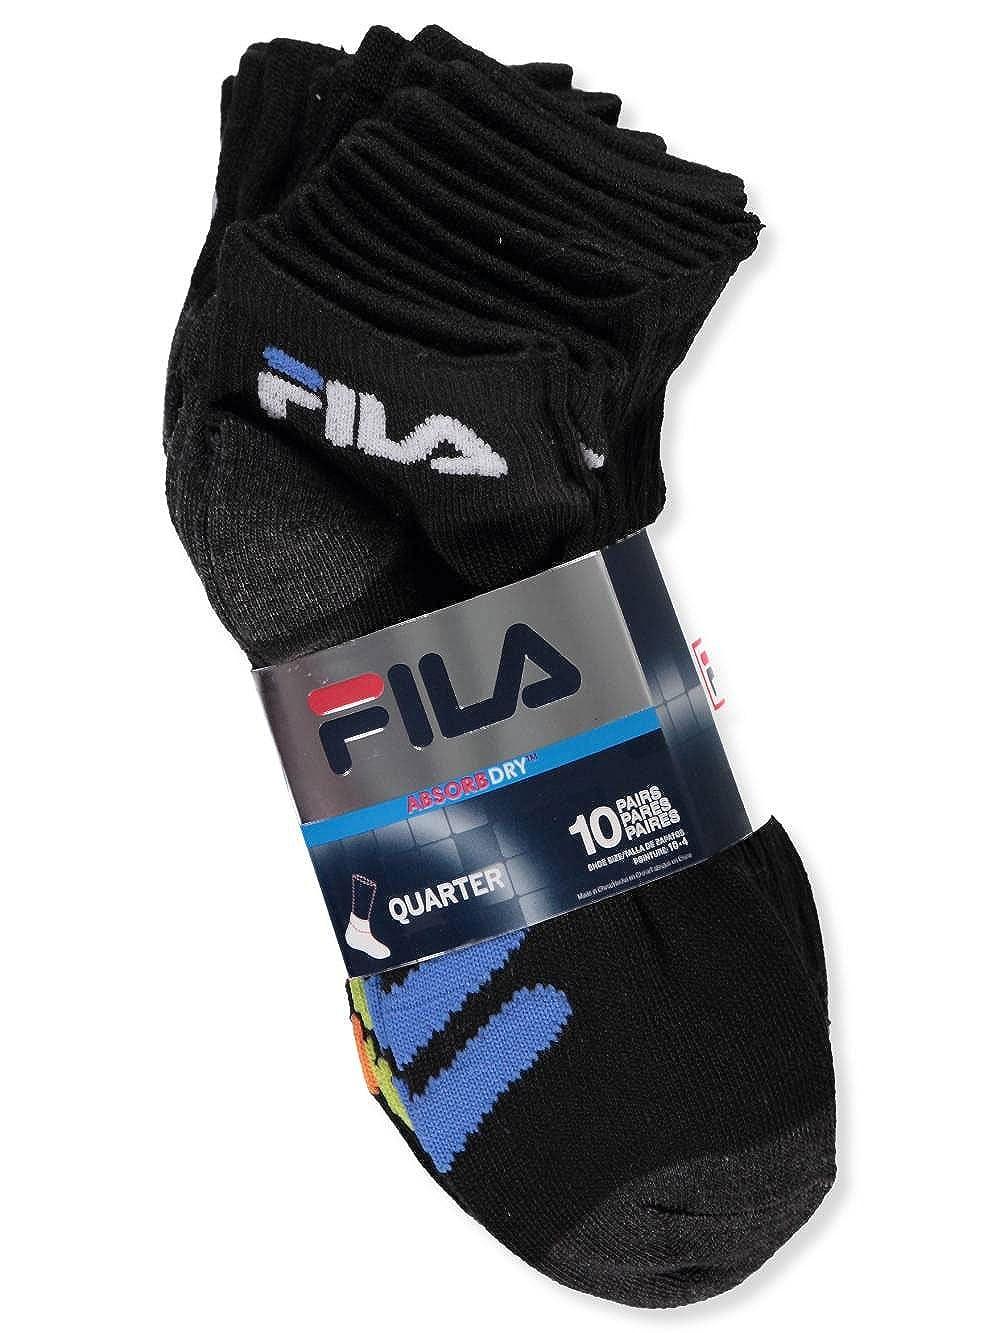 Amazon.com: Fila Little Boys 10-Pack Quarter Crew Socks - black, 6-8: Clothing